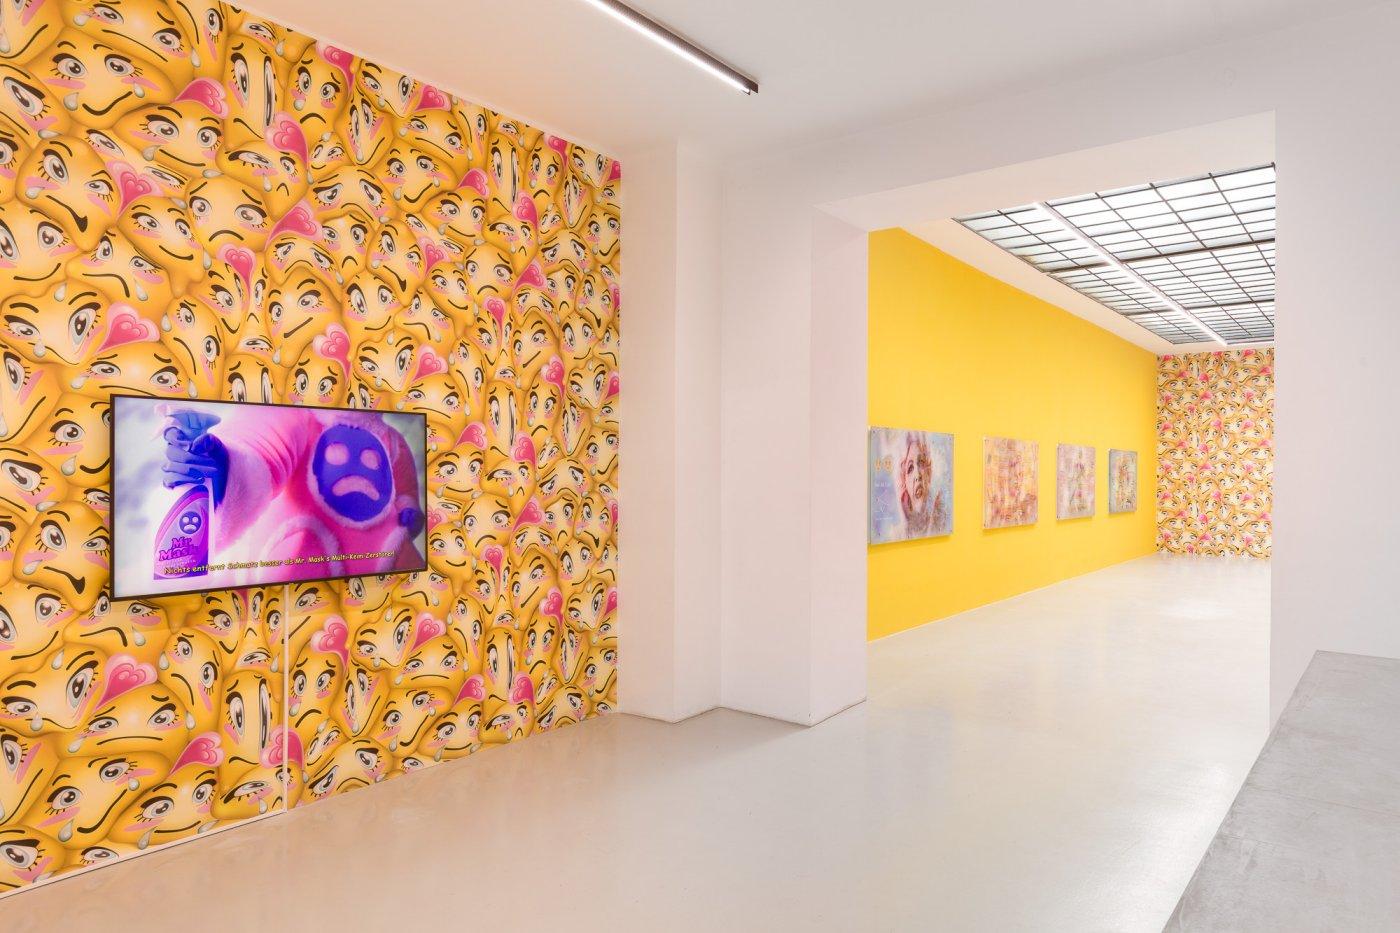 Galerie Kandlhofer Rachel Maclean new 5